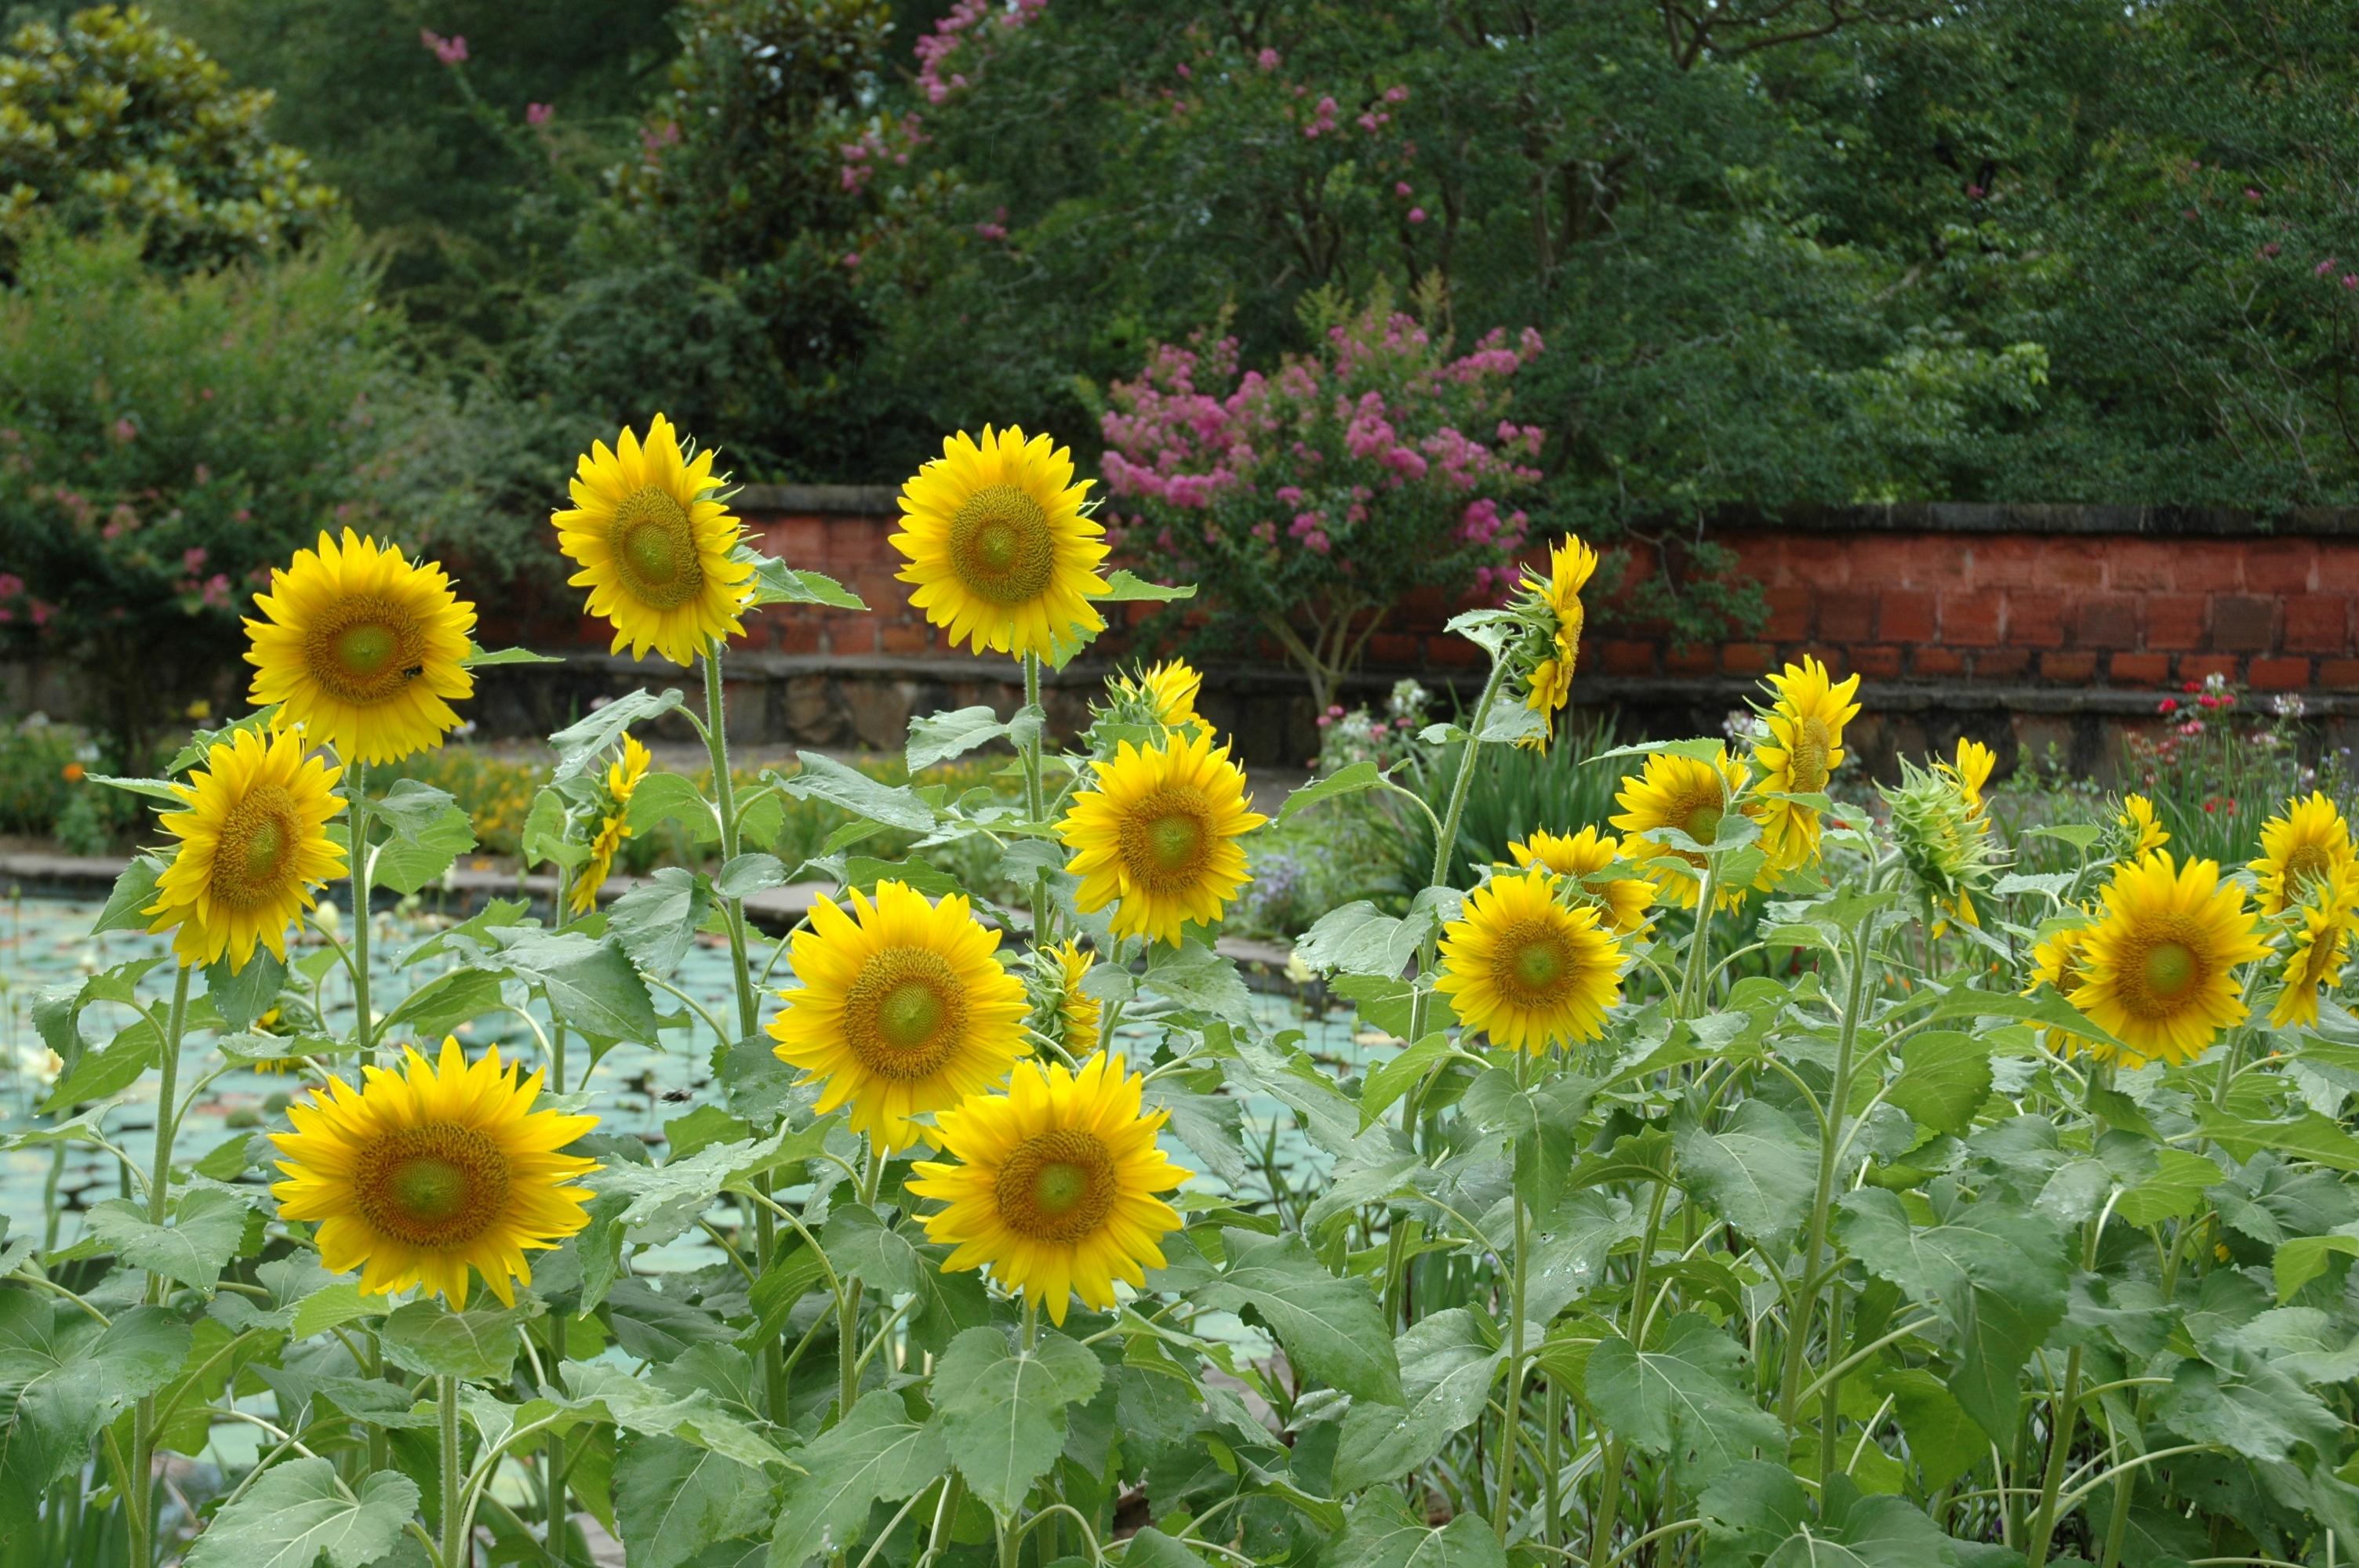 https://alabama-travel.s3.amazonaws.com/partners-uploads/photo/image/59497c8d7373907f23000041/sunflowers_2010.jpg